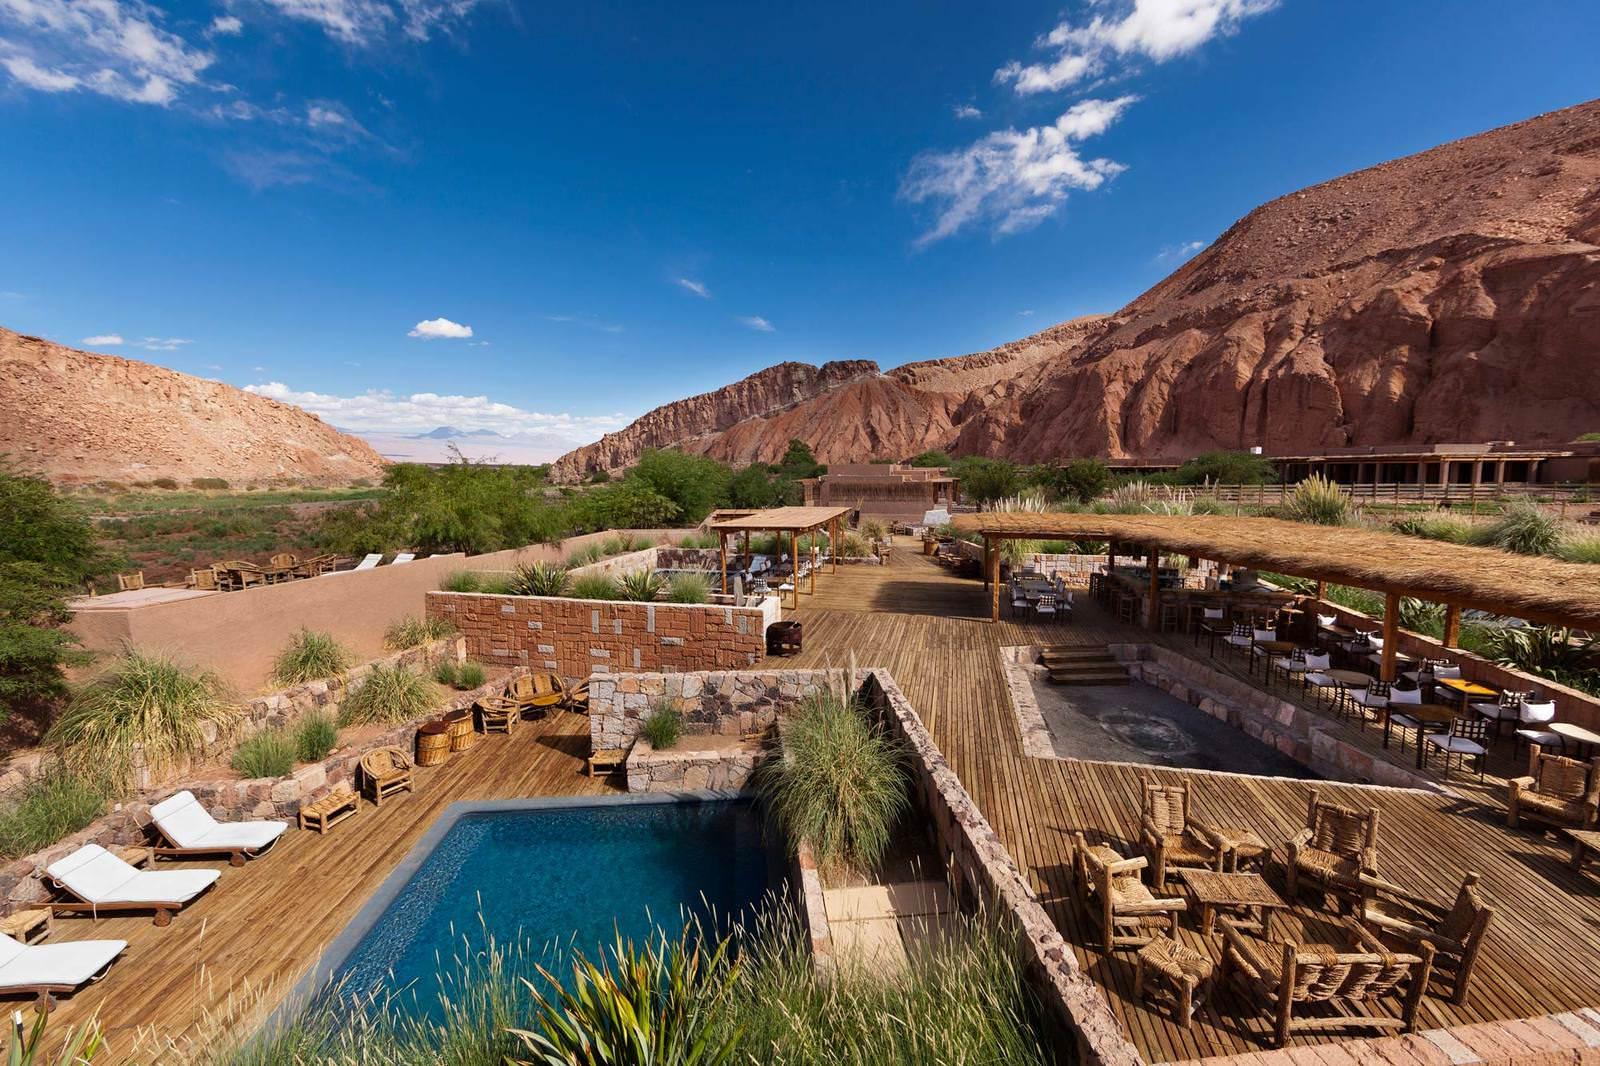 Best List of Hotels in San Pedro de Atacama, Chile - Hotel Alto Atacama Desert Lodge and Spa